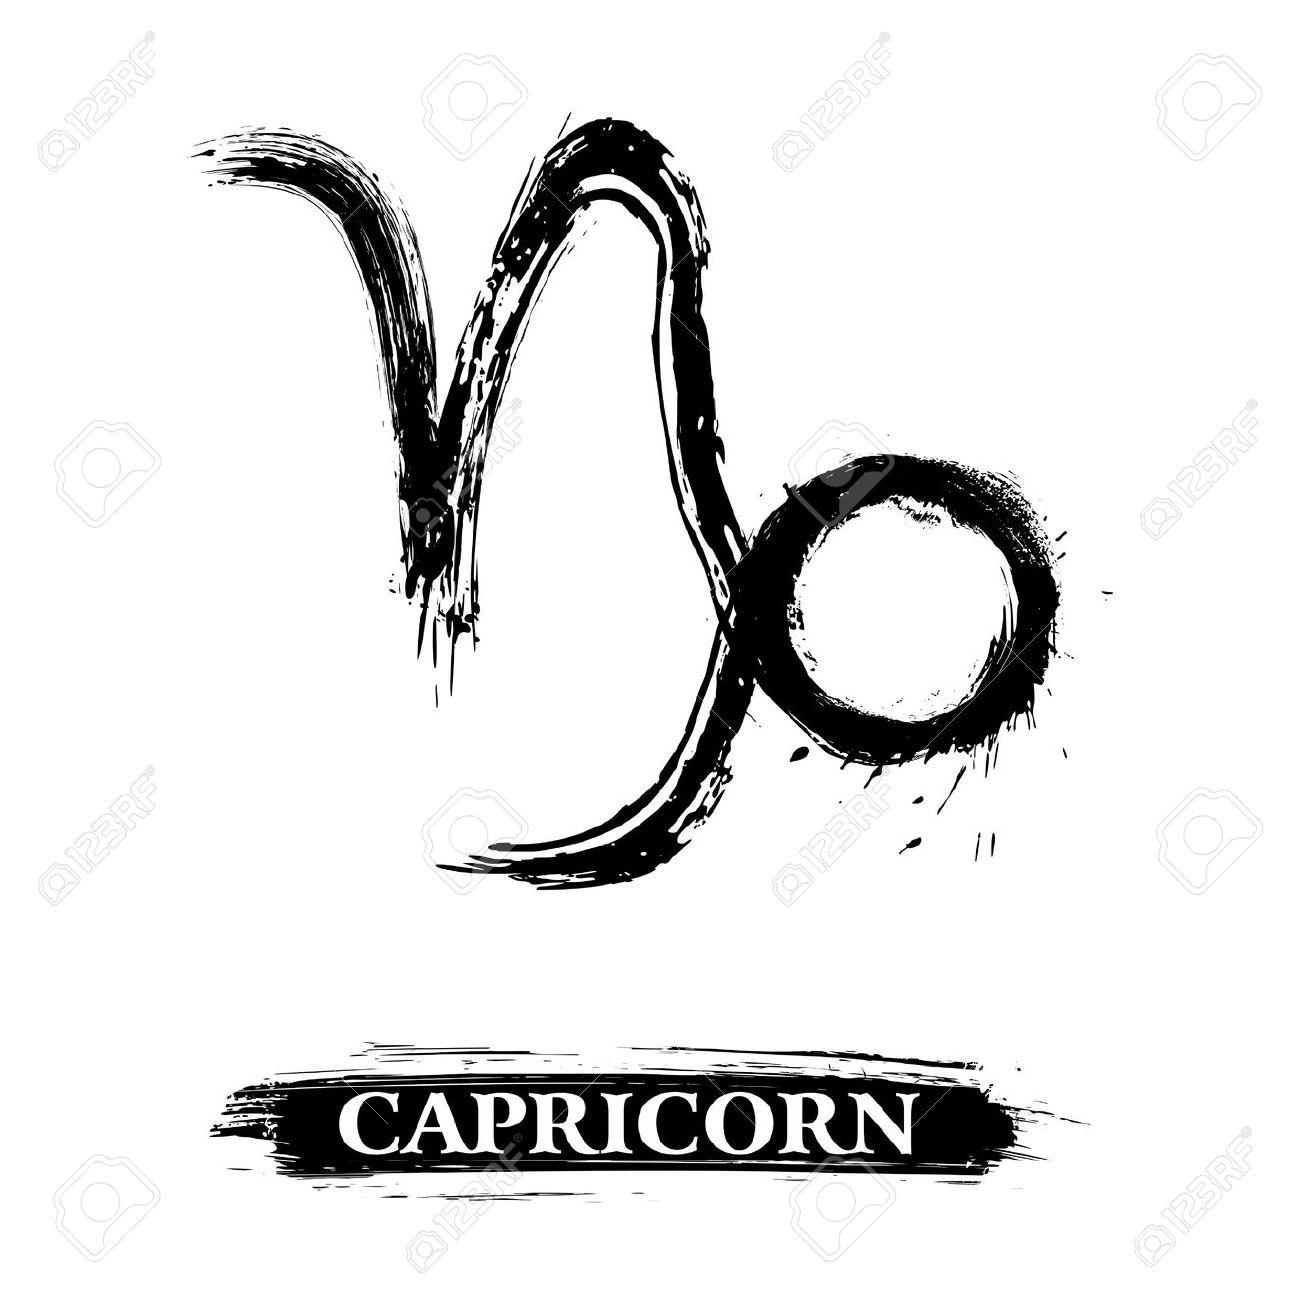 Capricorn Symbol Royalty Free Cliparts, Vectors, And Stock.